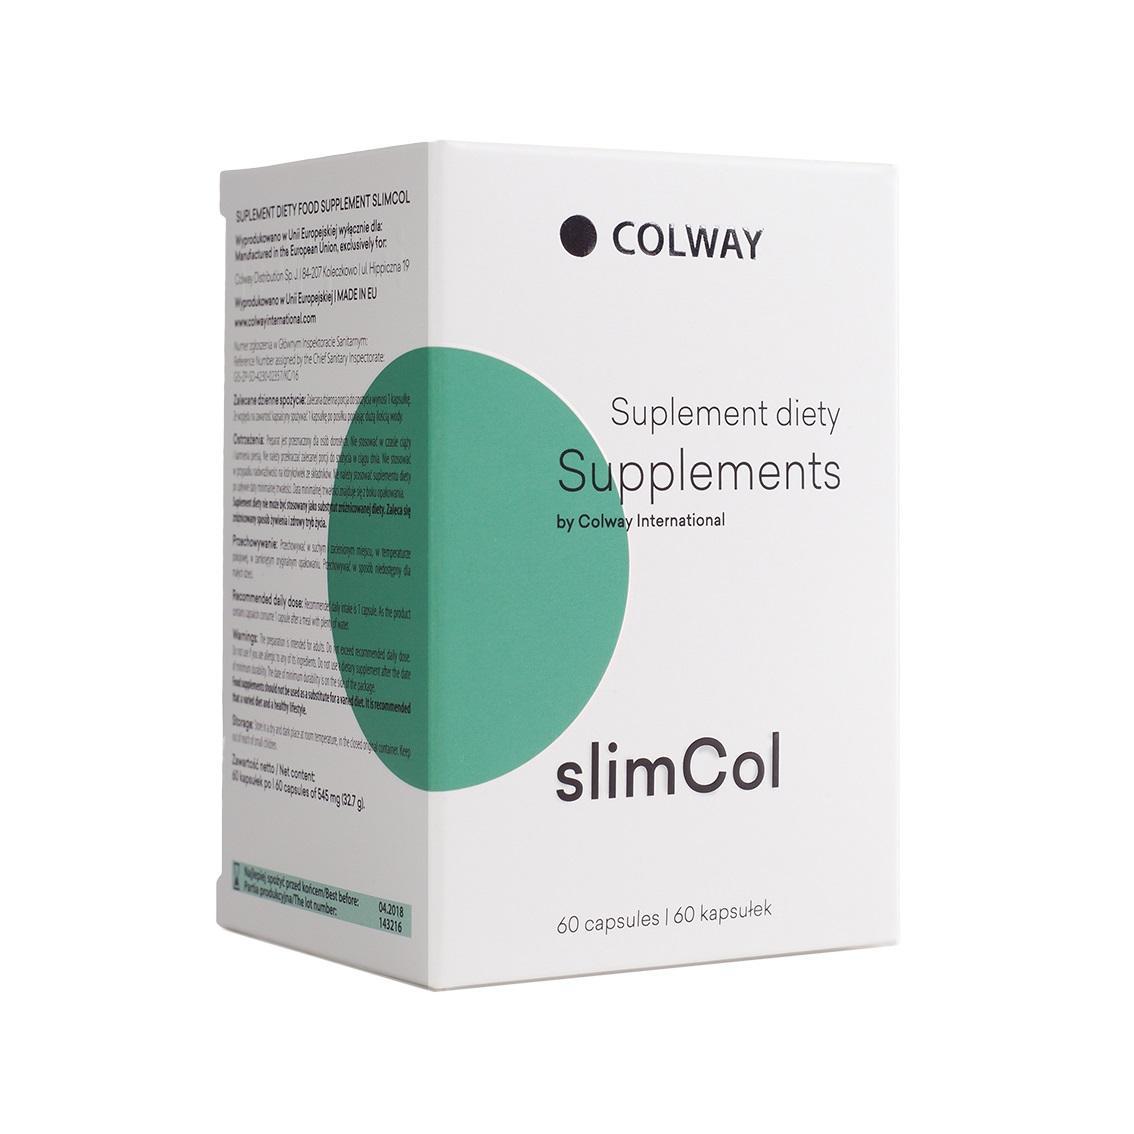 SlimCol SlimCol  60br COLWAY INTERNATIONAL